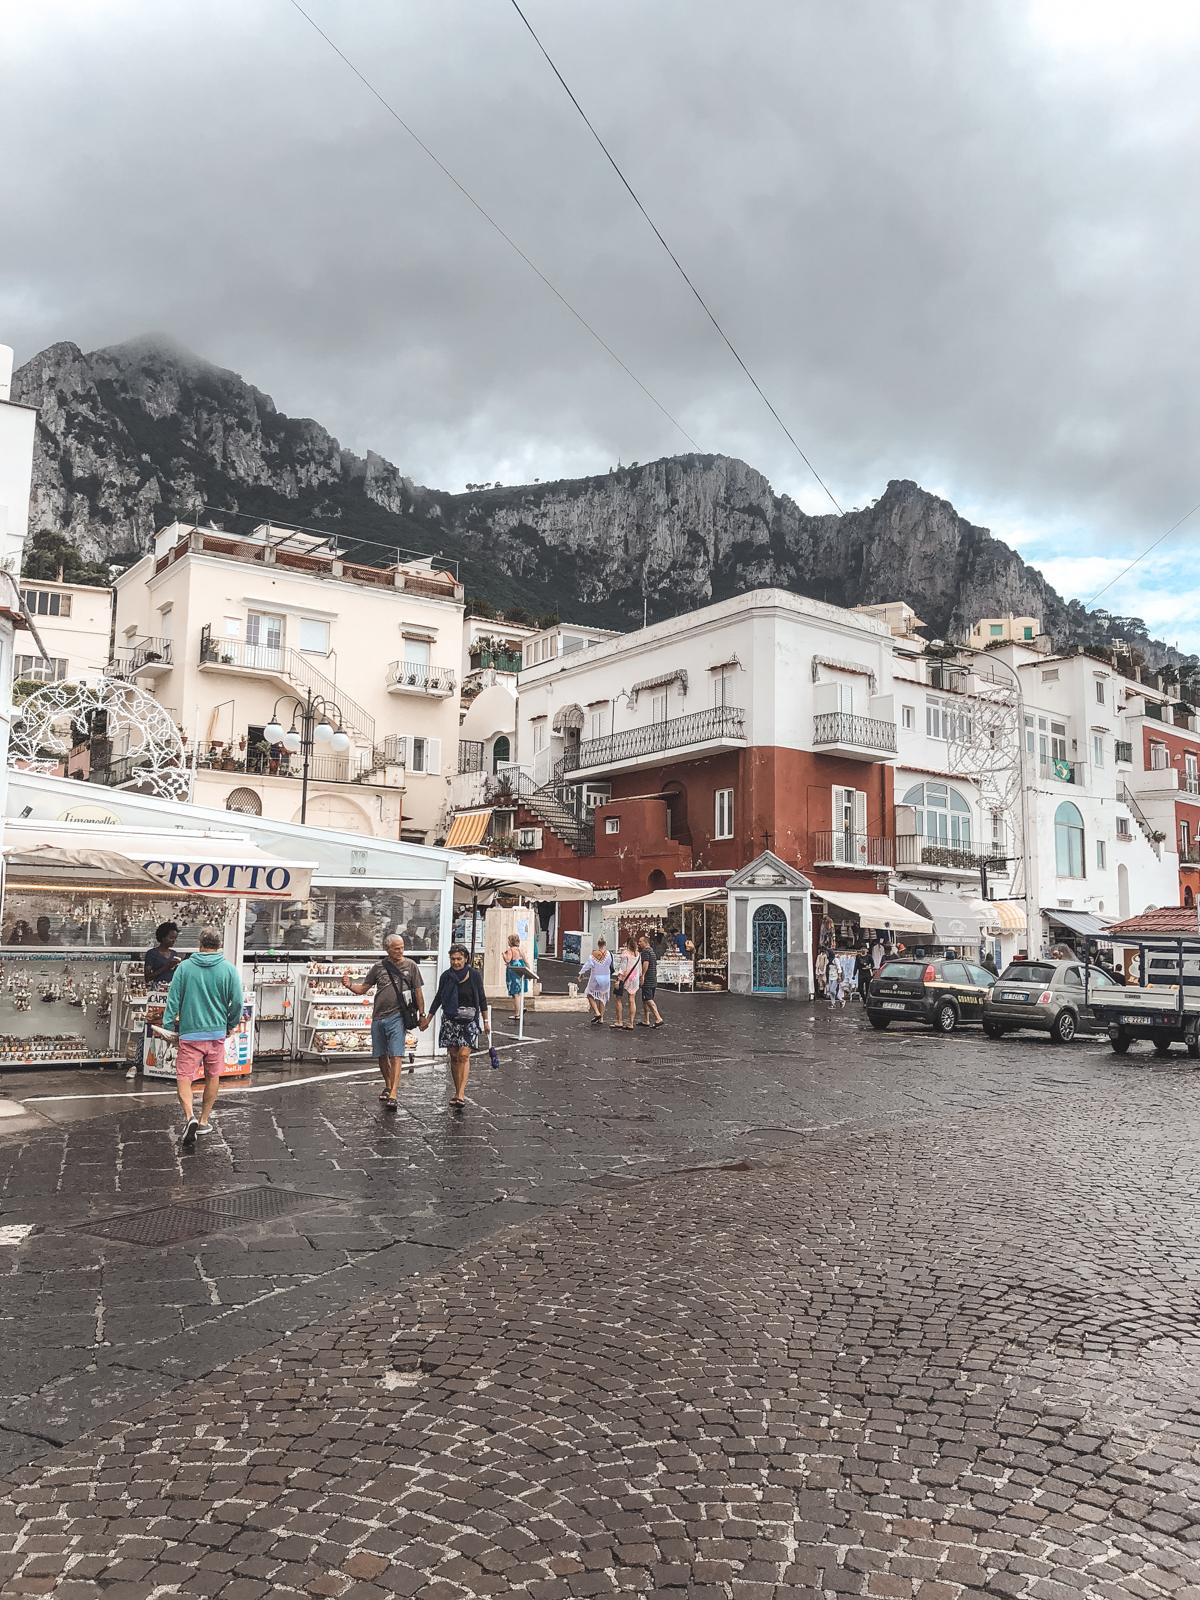 rainy, cloudy view when you arrive on Capri